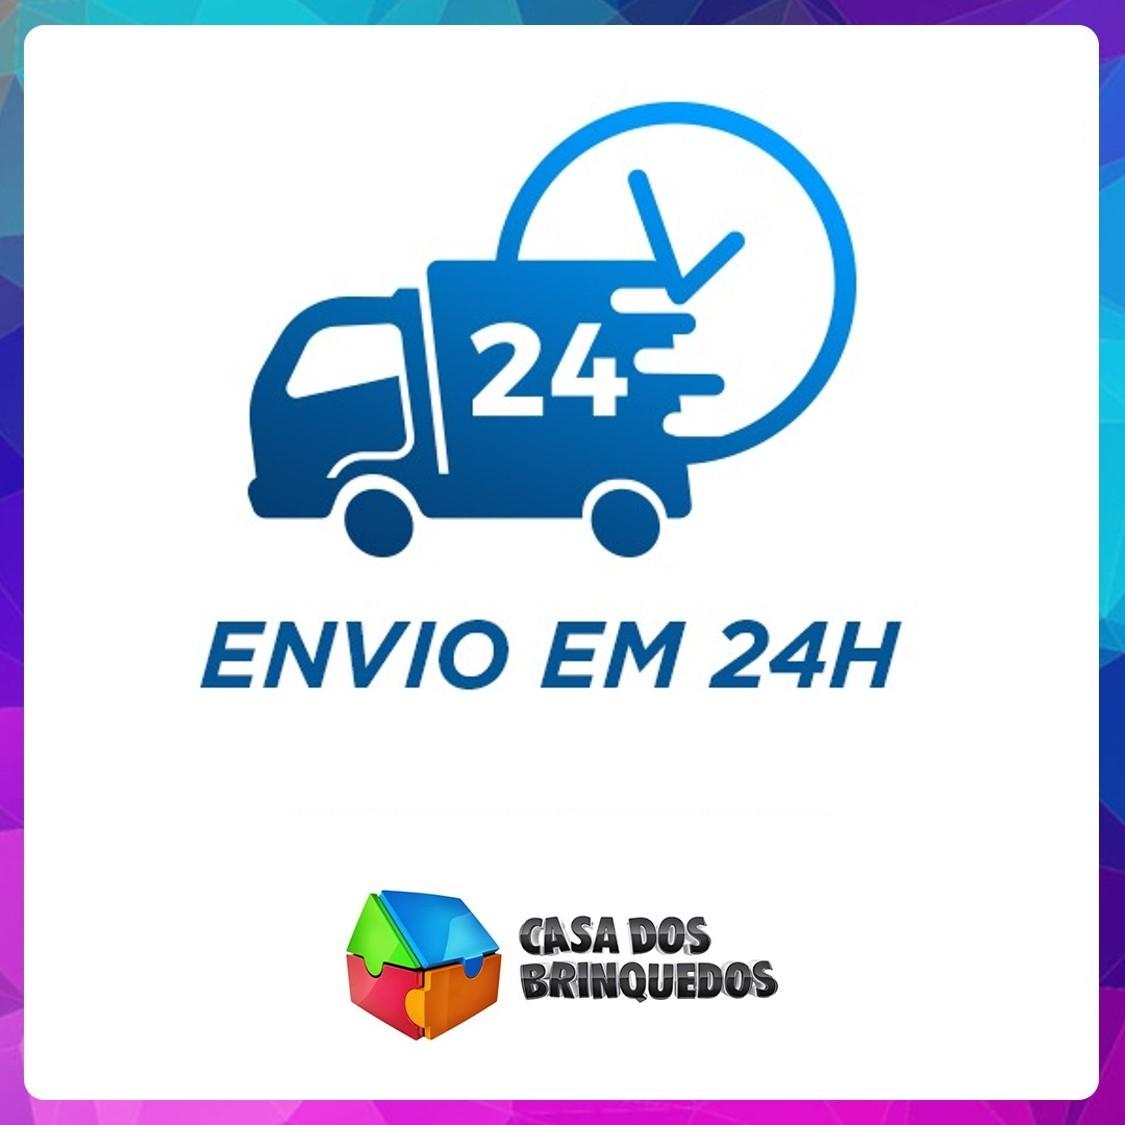 LEÃO DE VINIL VB234 DM PLAY